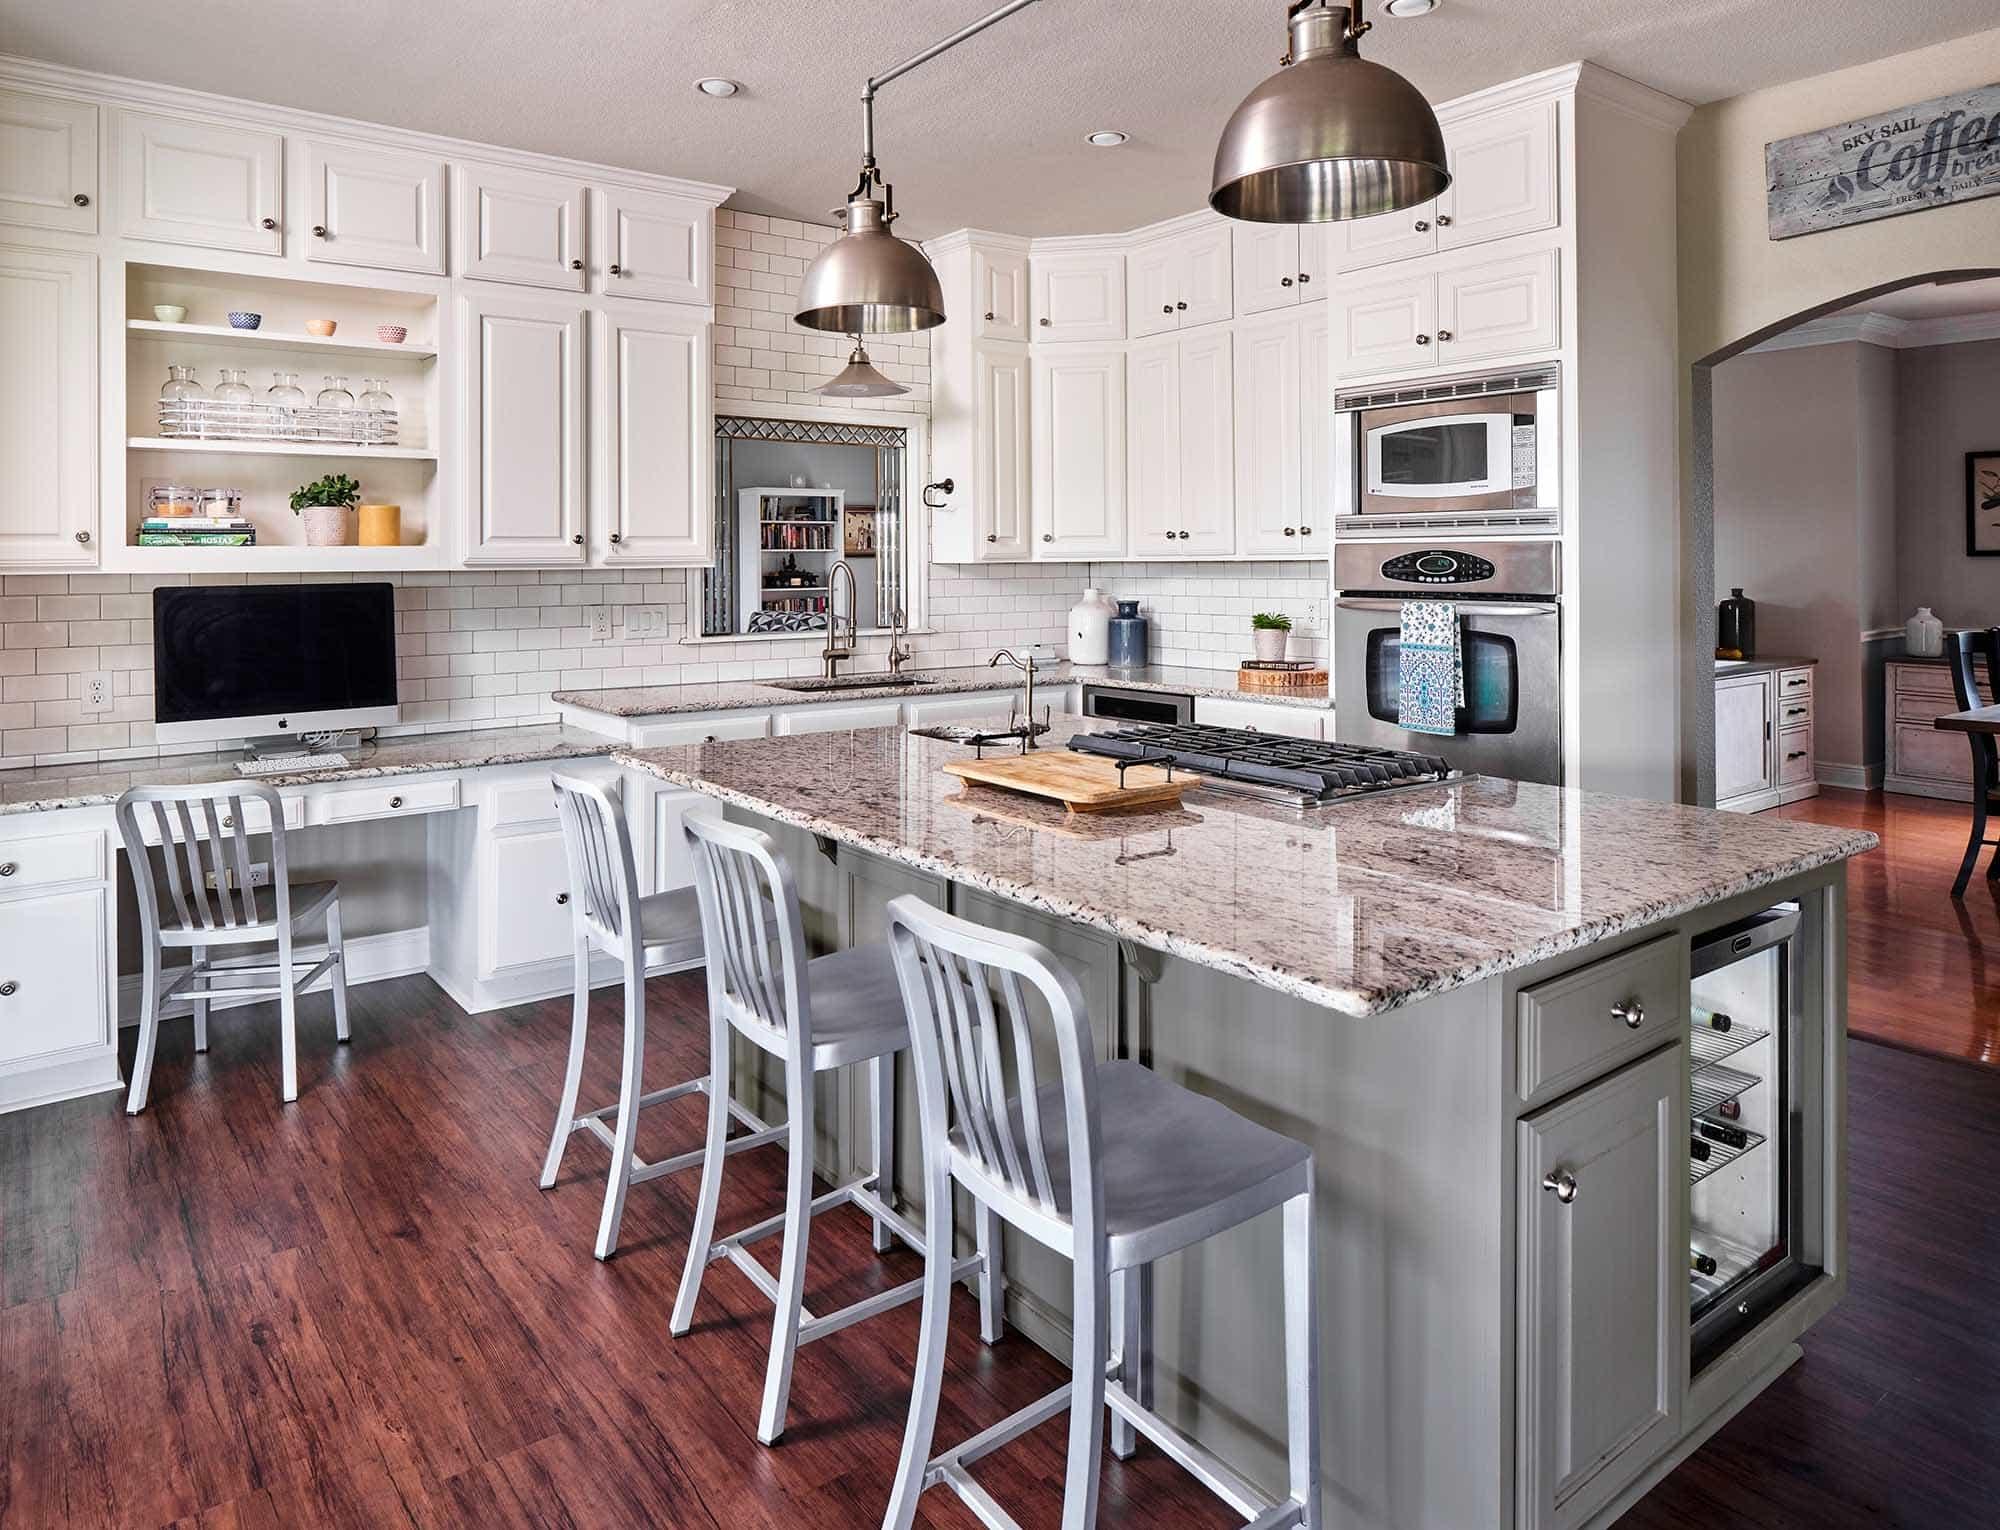 Kitchen cabinets painted in Benjamin Moore Cloud White and Tweed Coat, Paper Moon Painting San Antonio